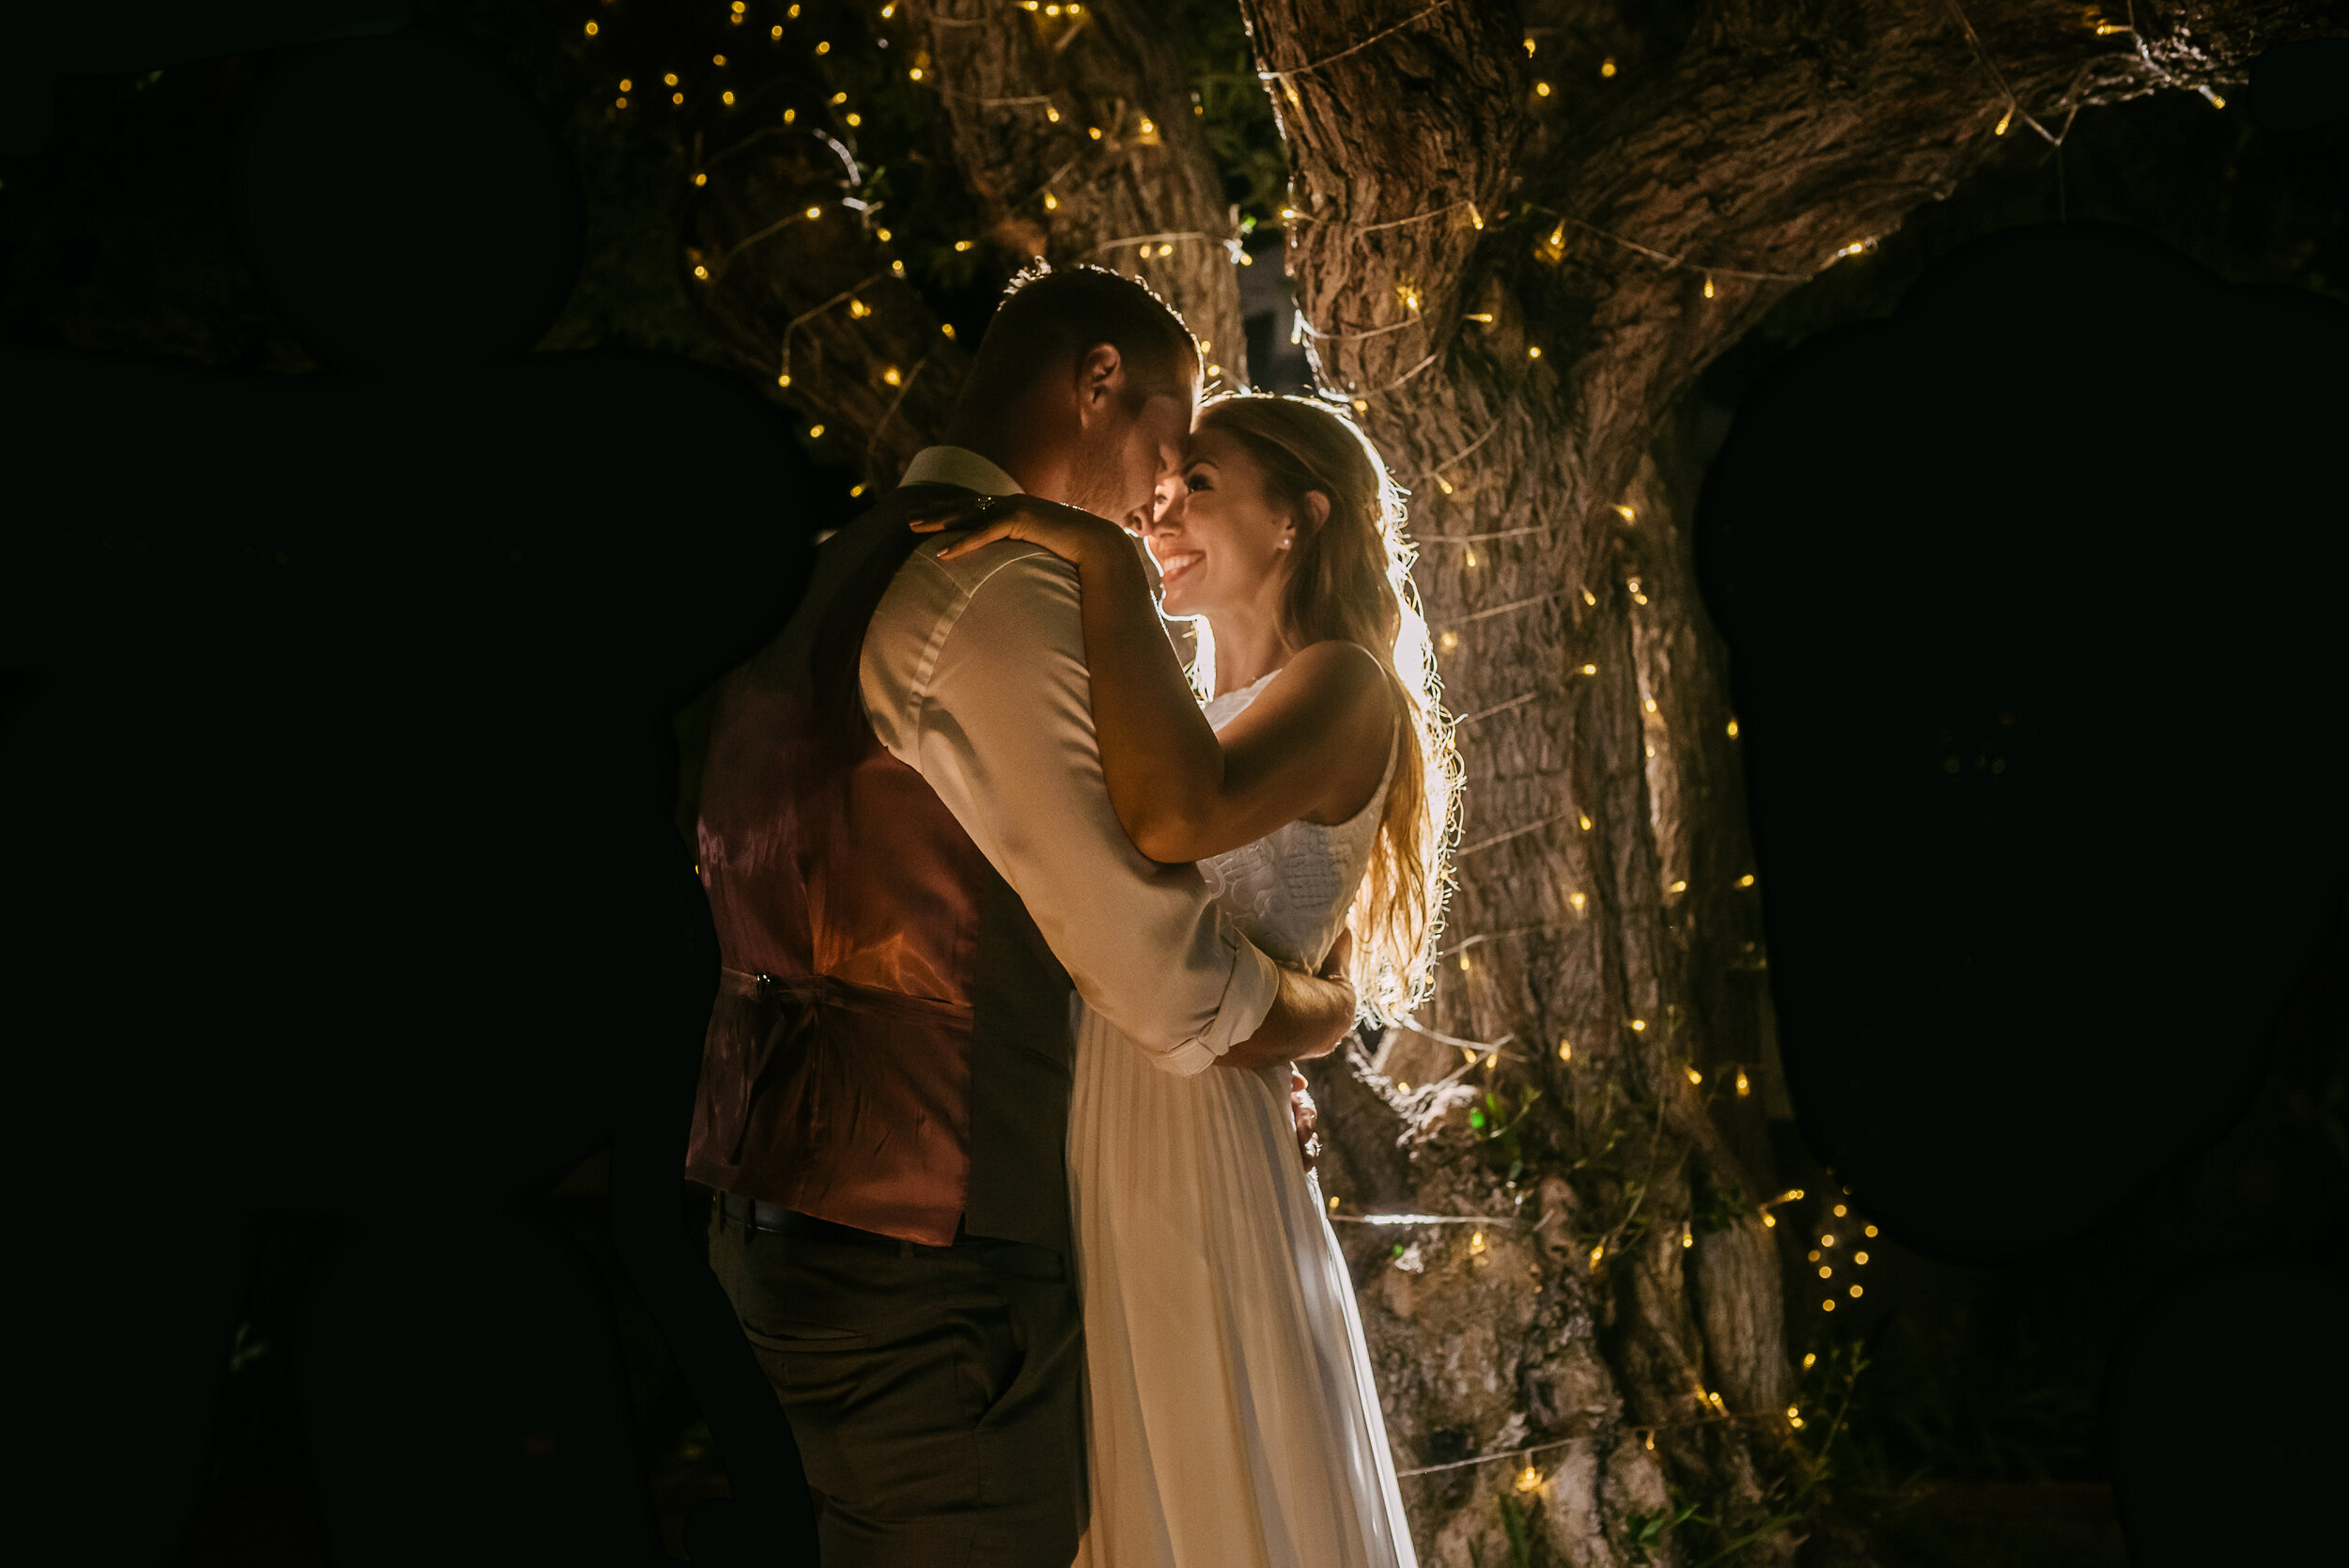 ashley-balboa-inn-wedding-portrait-1-6.jpg